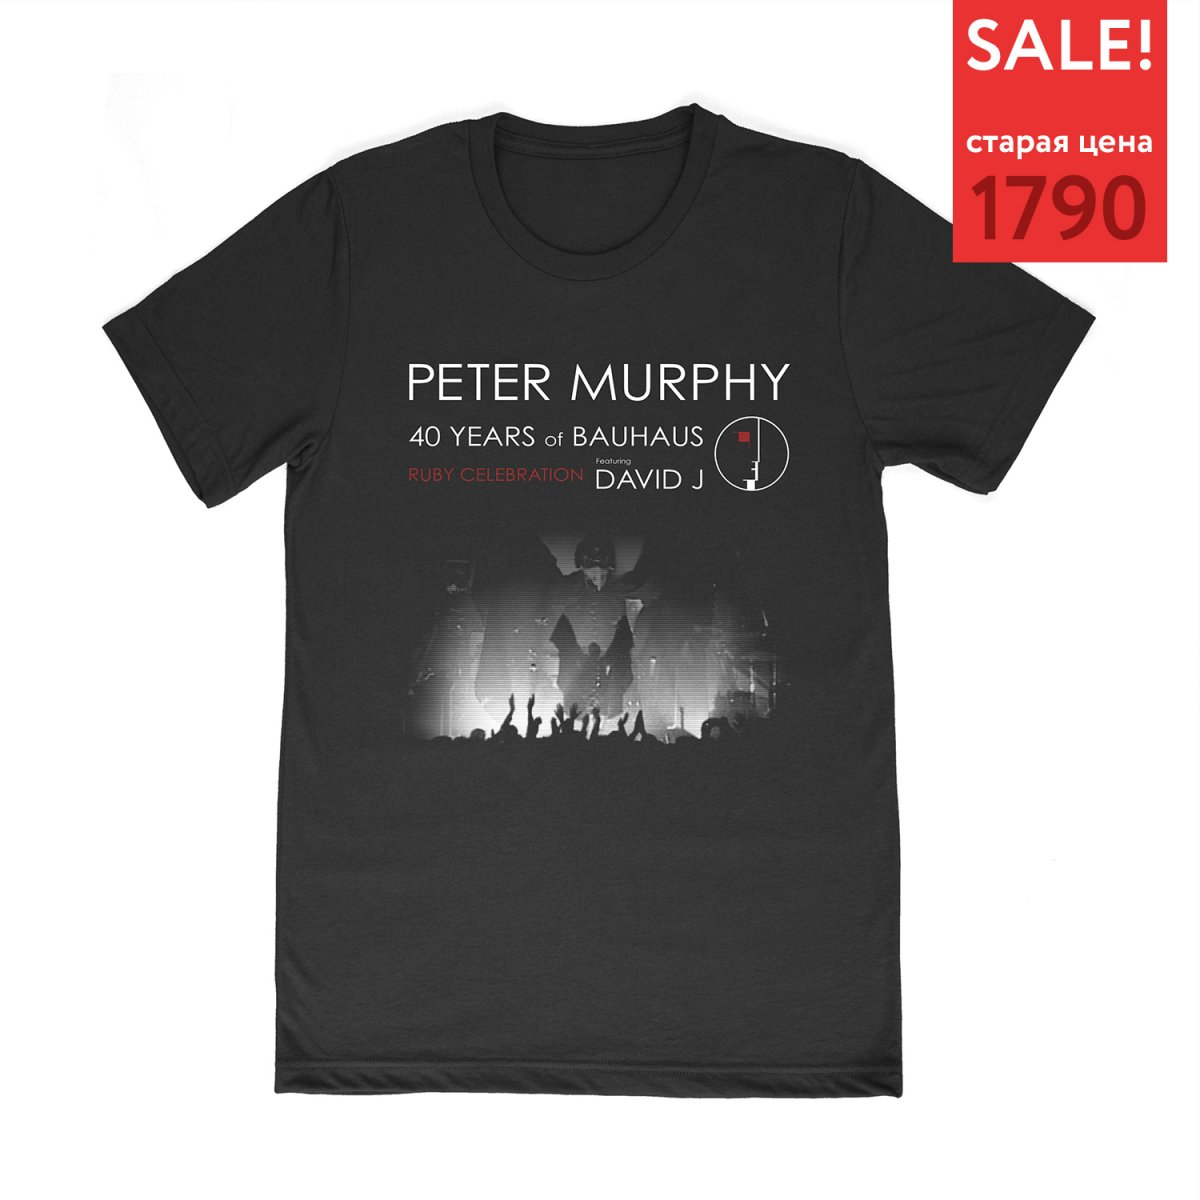 Футболка «Peter Murphy». Черная